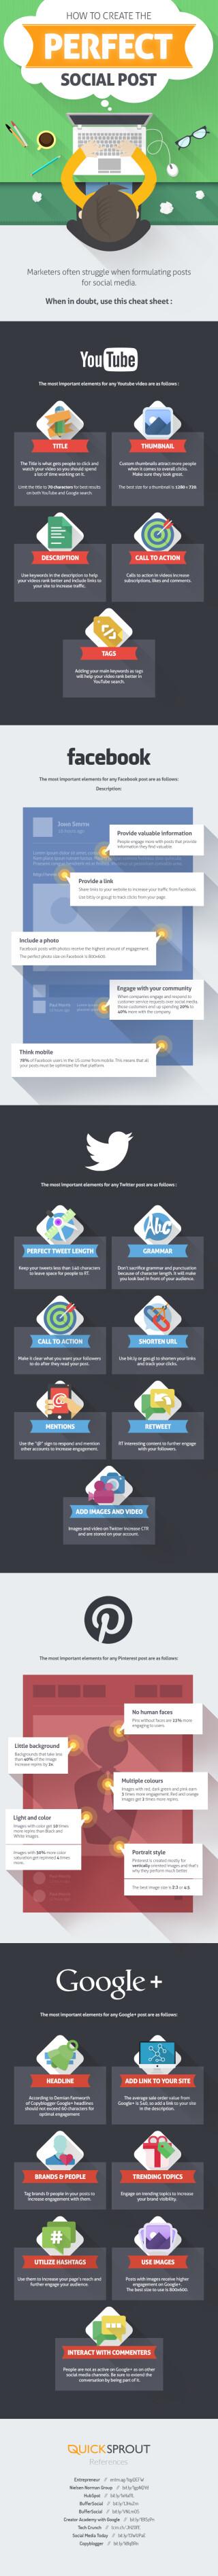 Infografik von Social Media